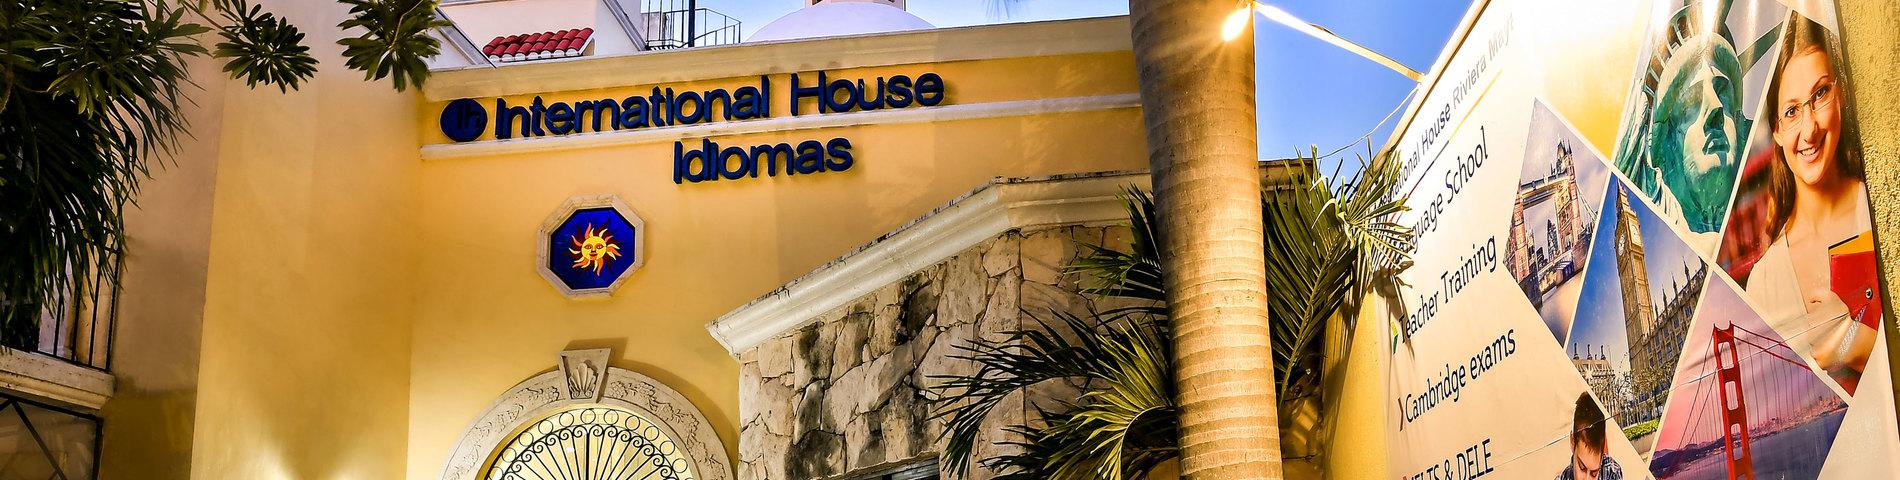 International House - Riviera Maya billede 1